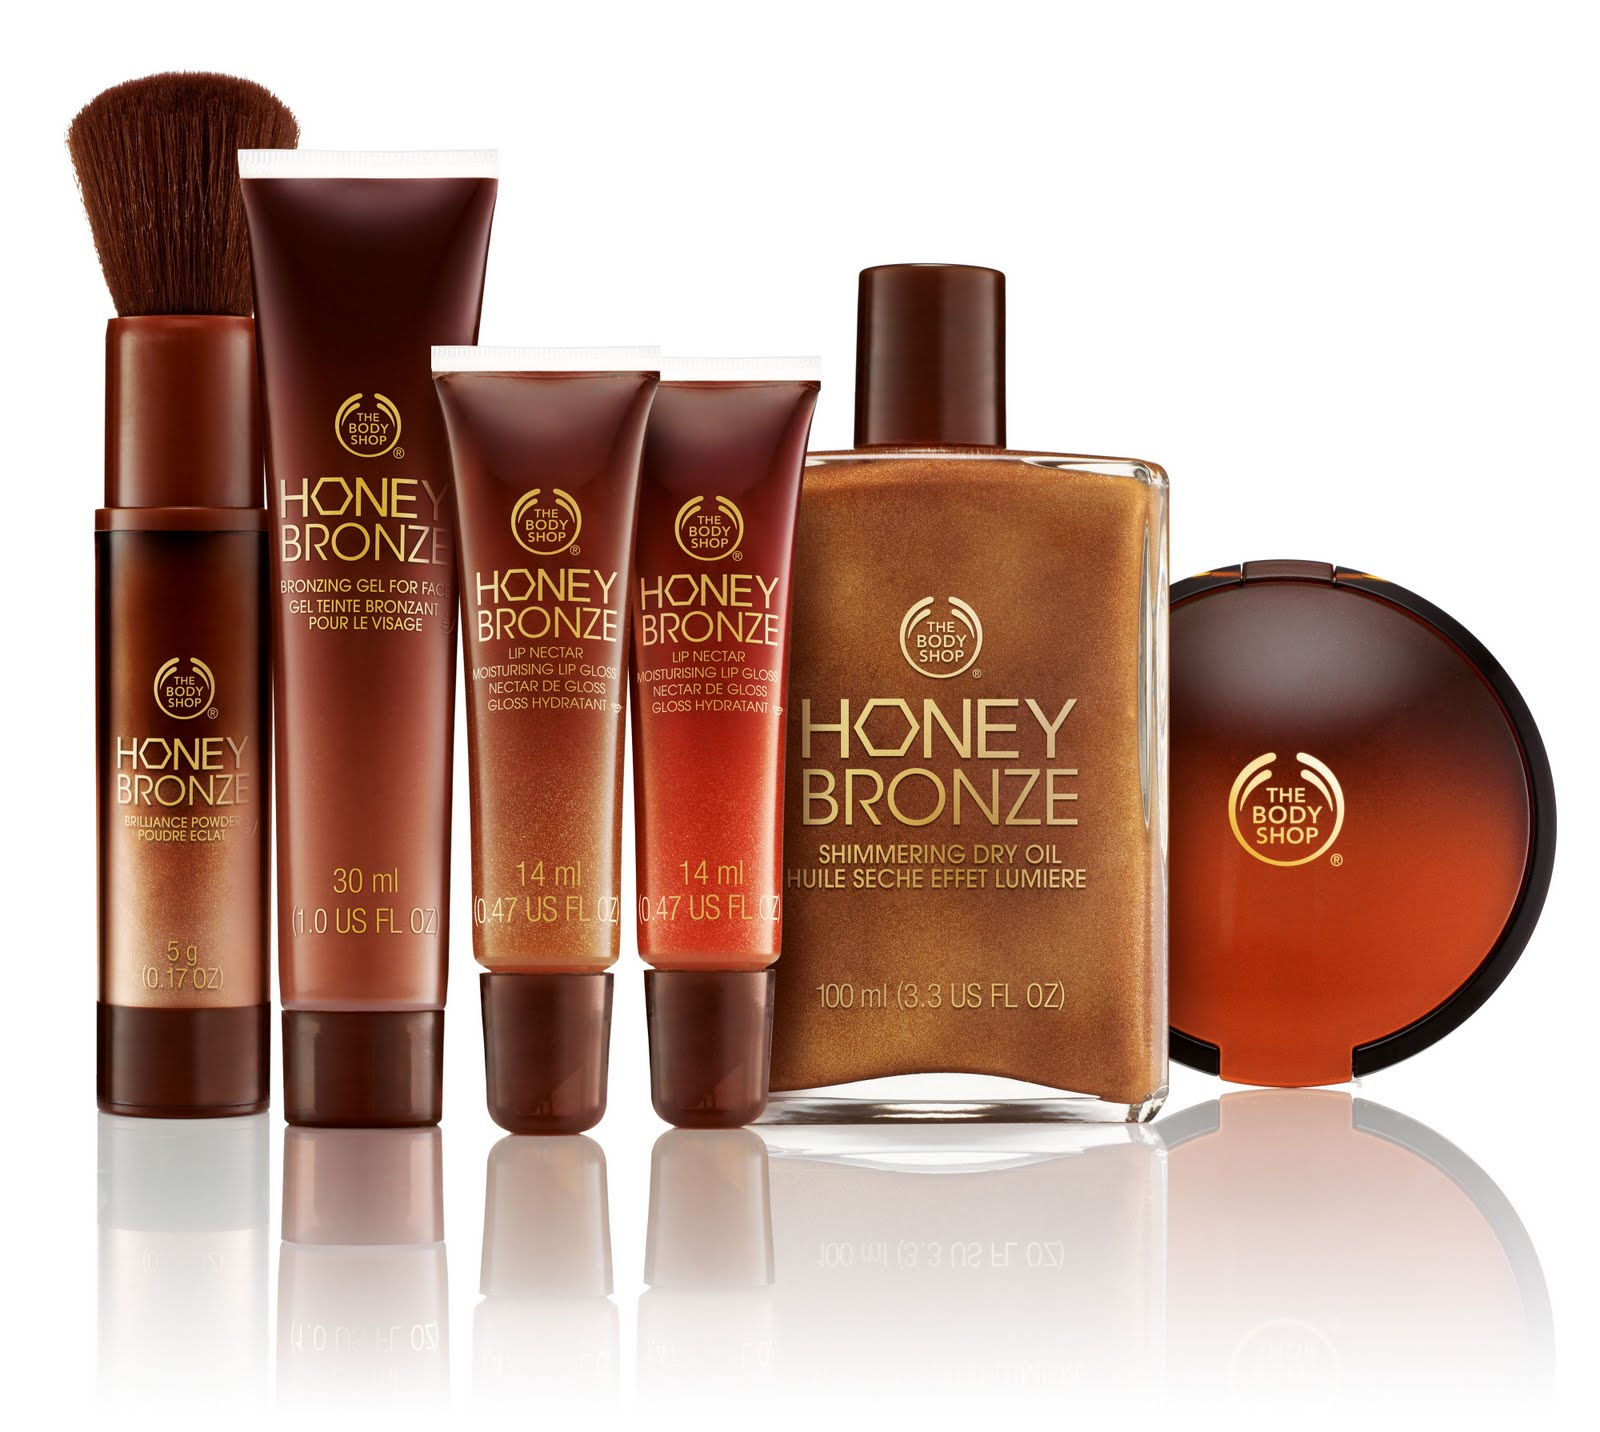 how to use honey bronze body shop